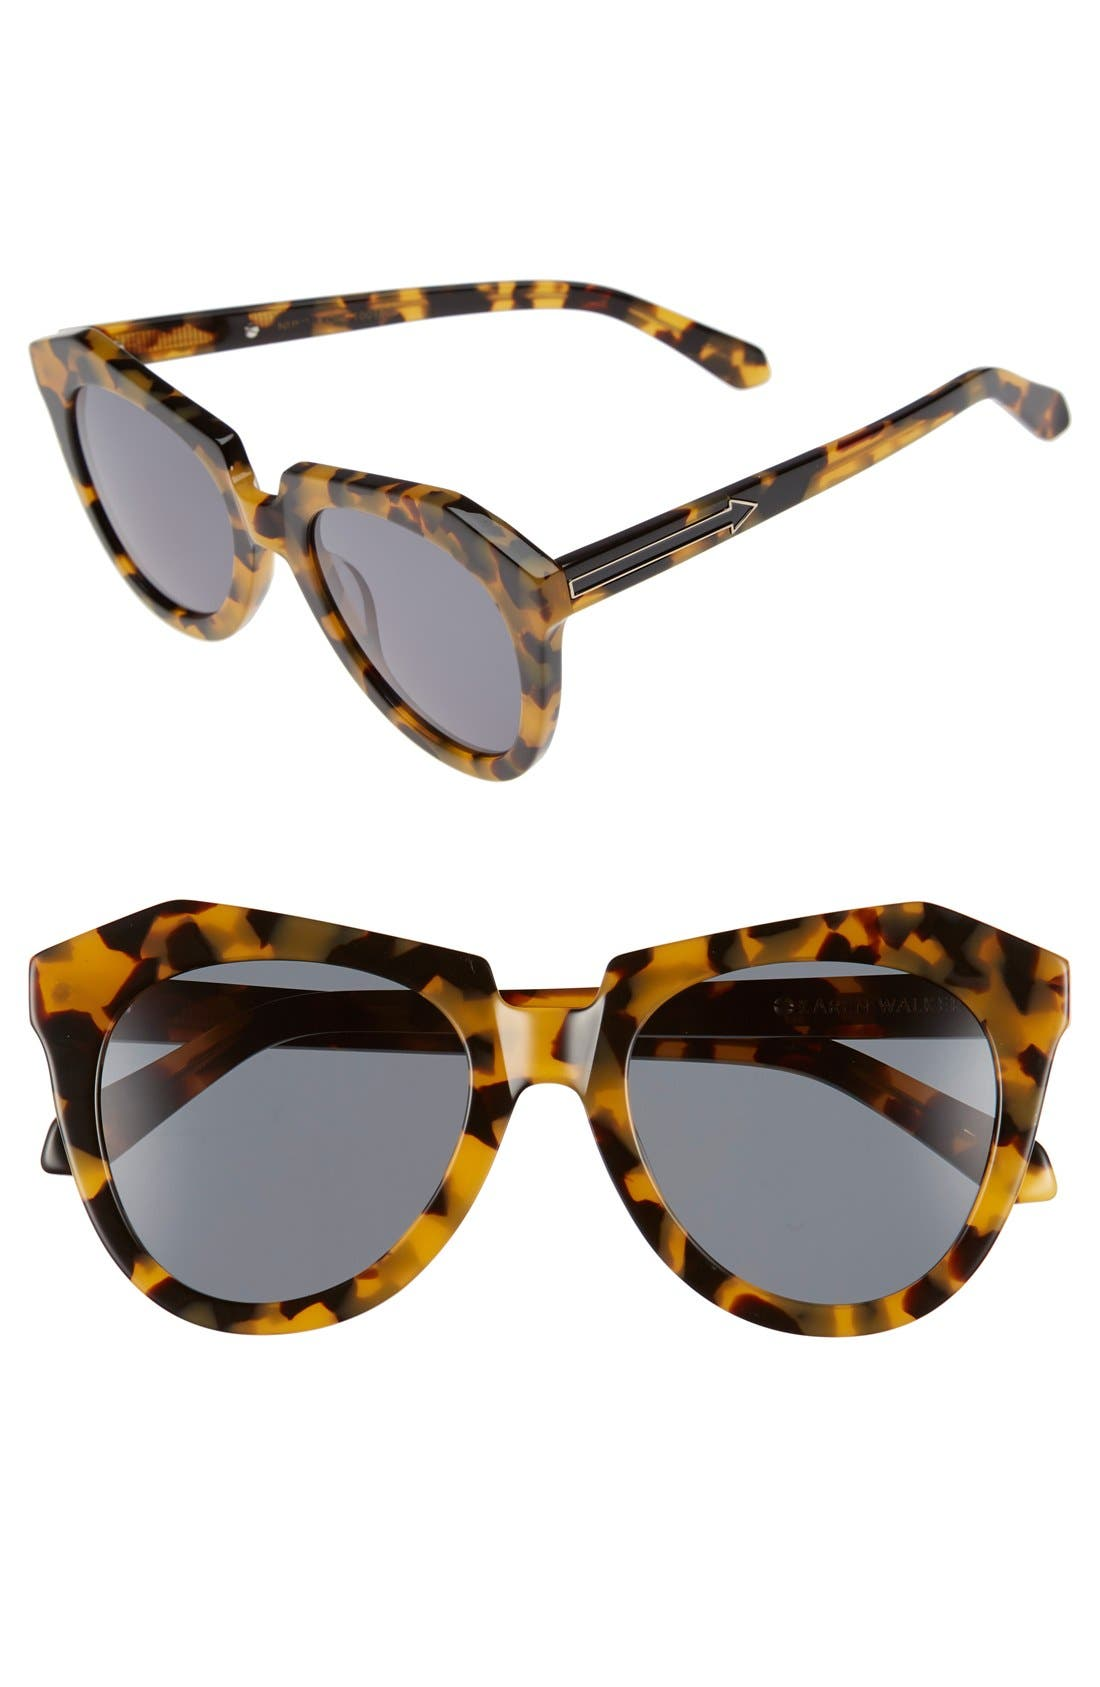 Main Image - Karen Walker 'Number One' 50mm Sunglasses